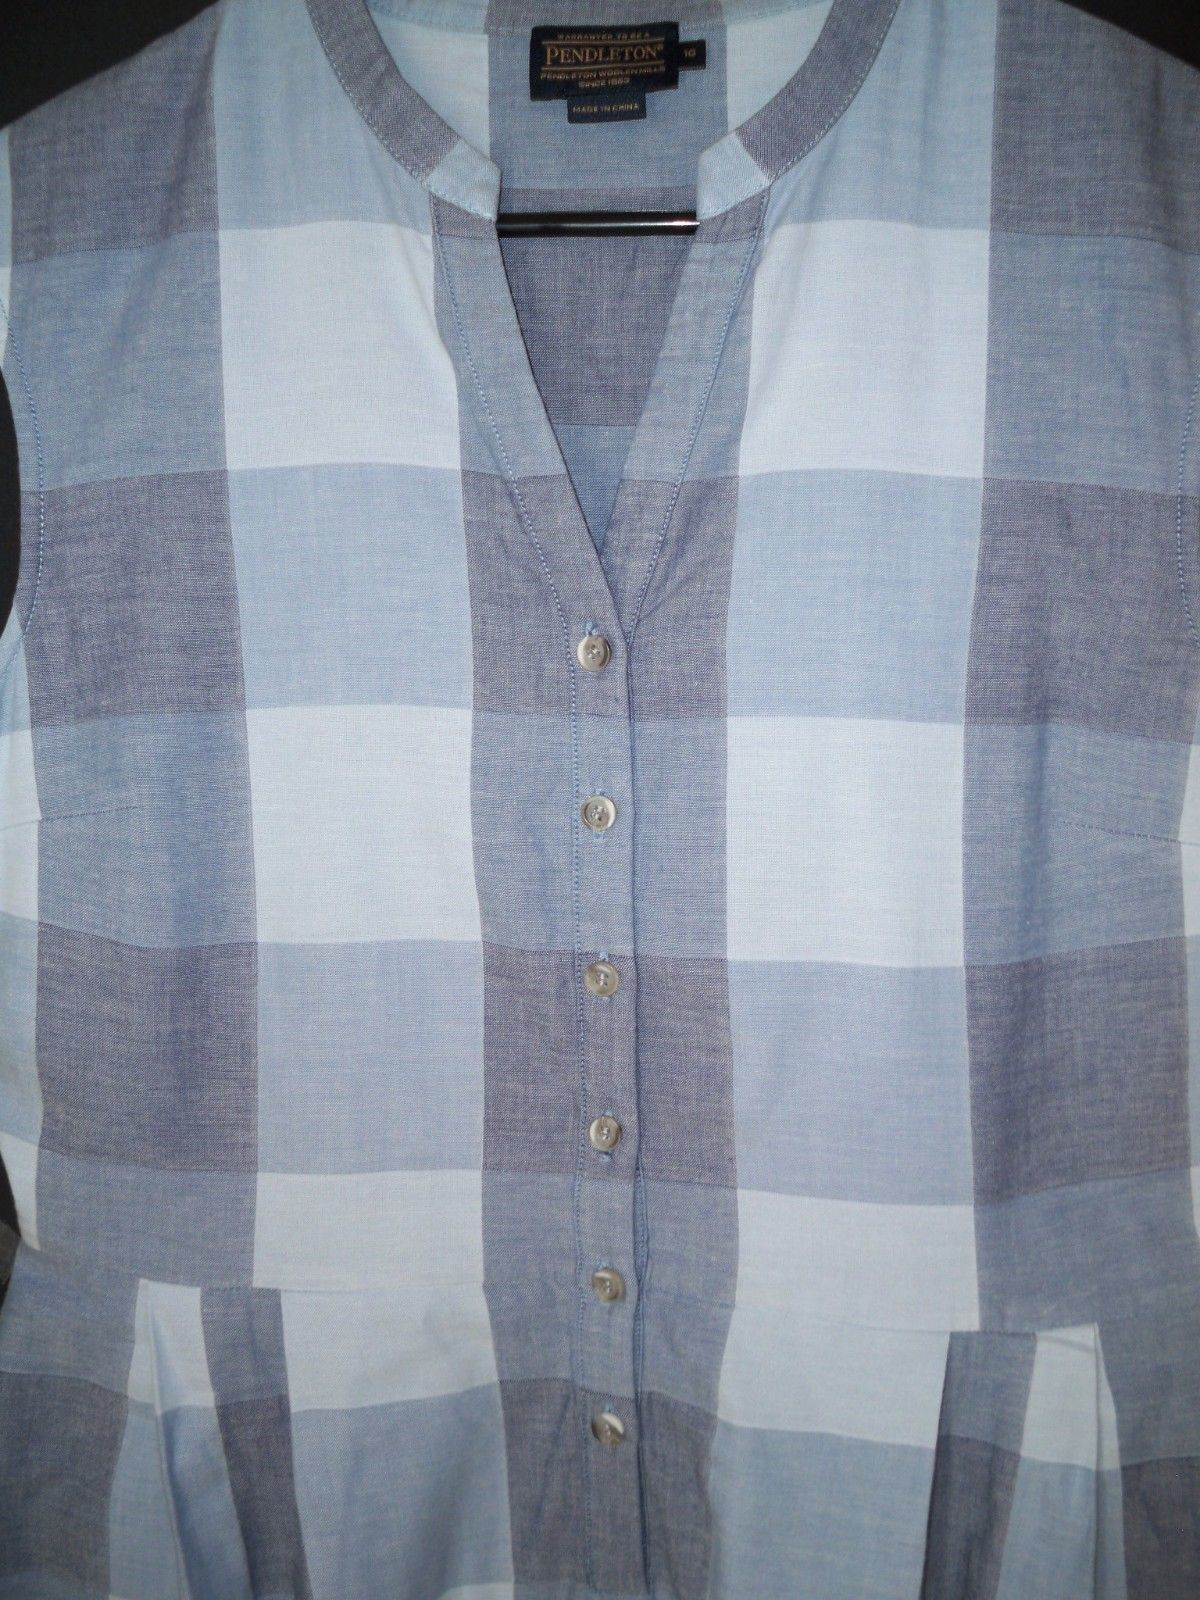 Pendleton Malena Dress Plaid Check Cotton Shirt-dress Midi 10